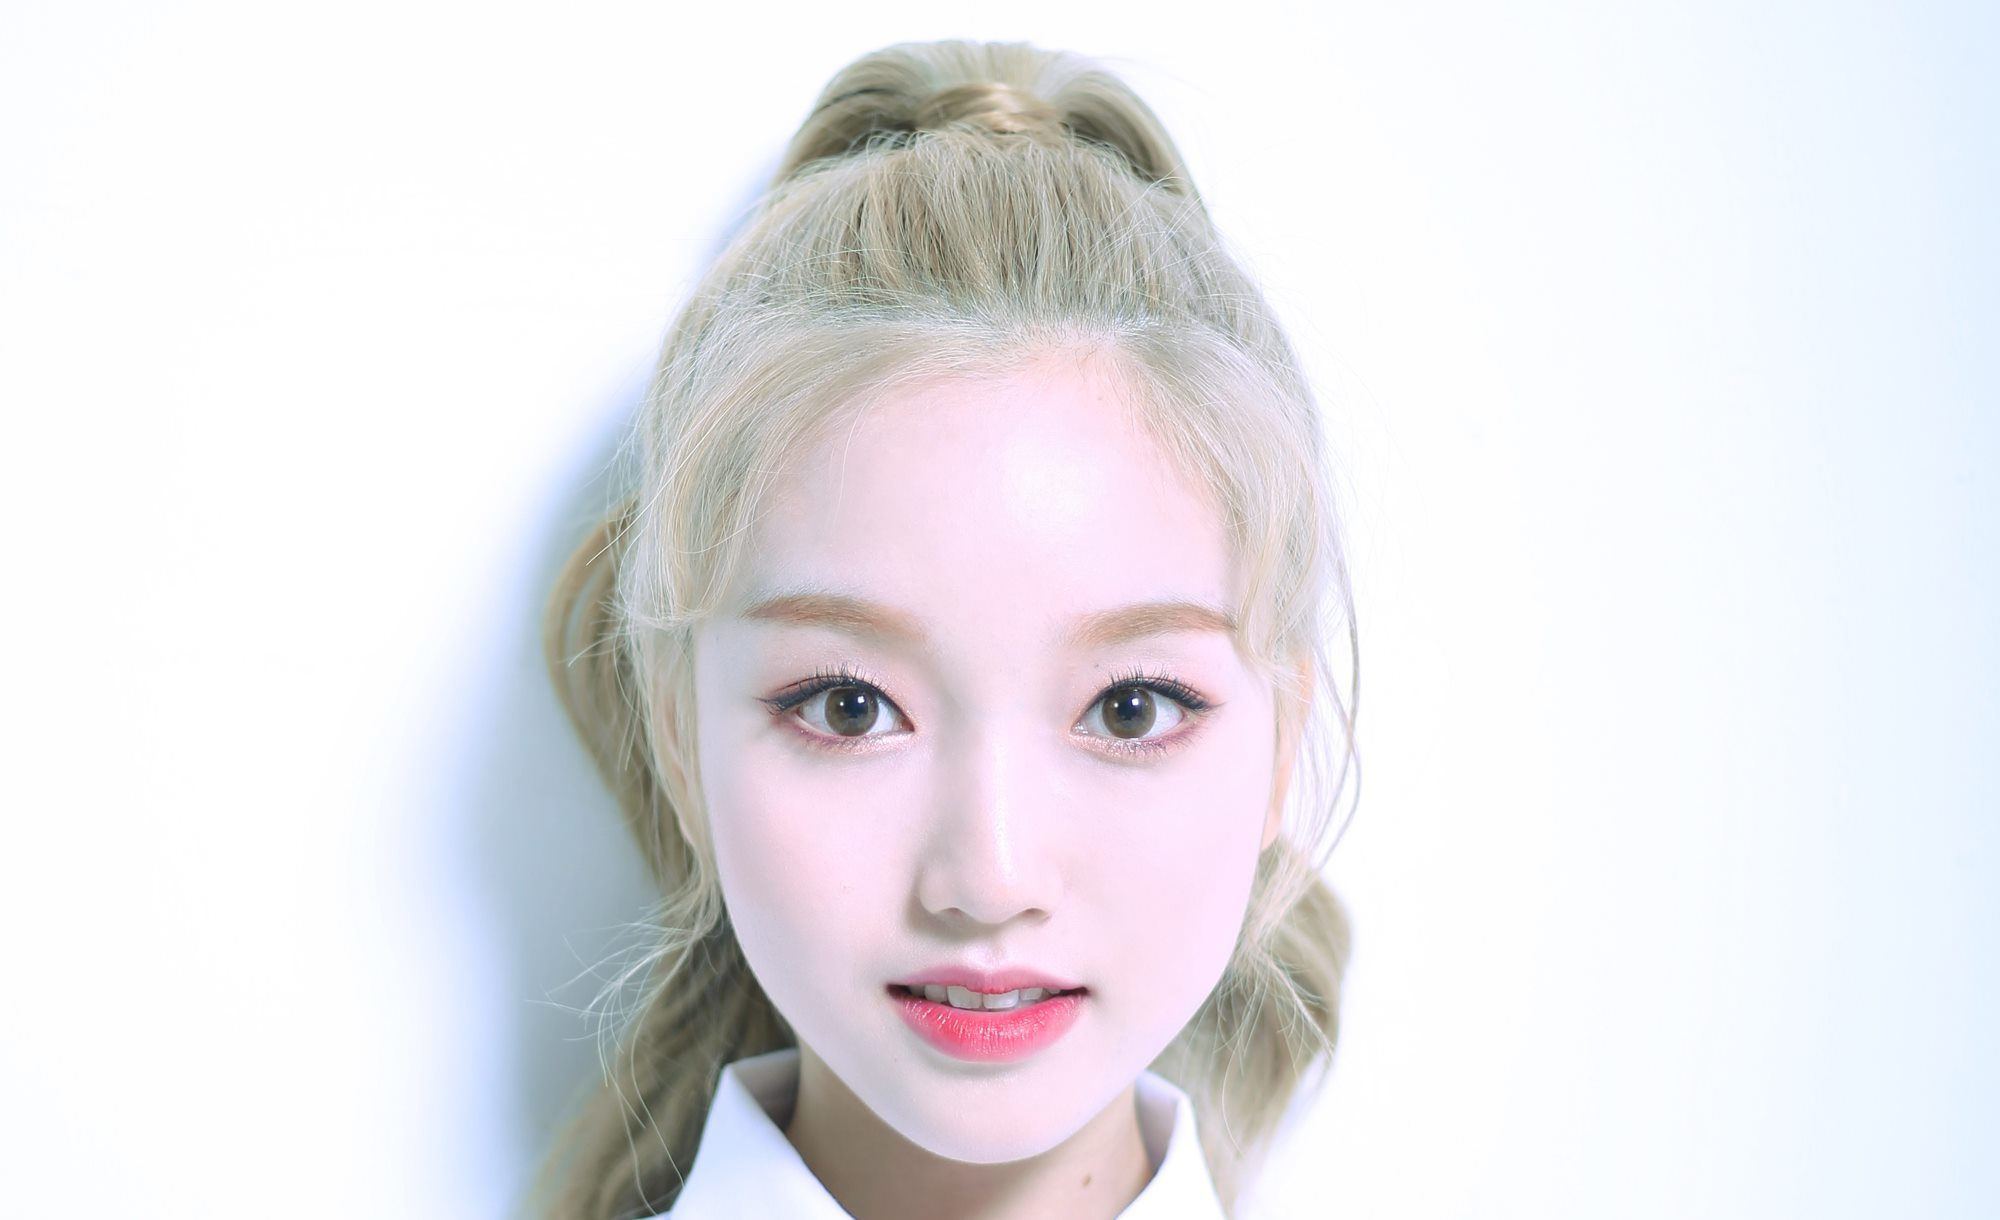 Loona Gowon